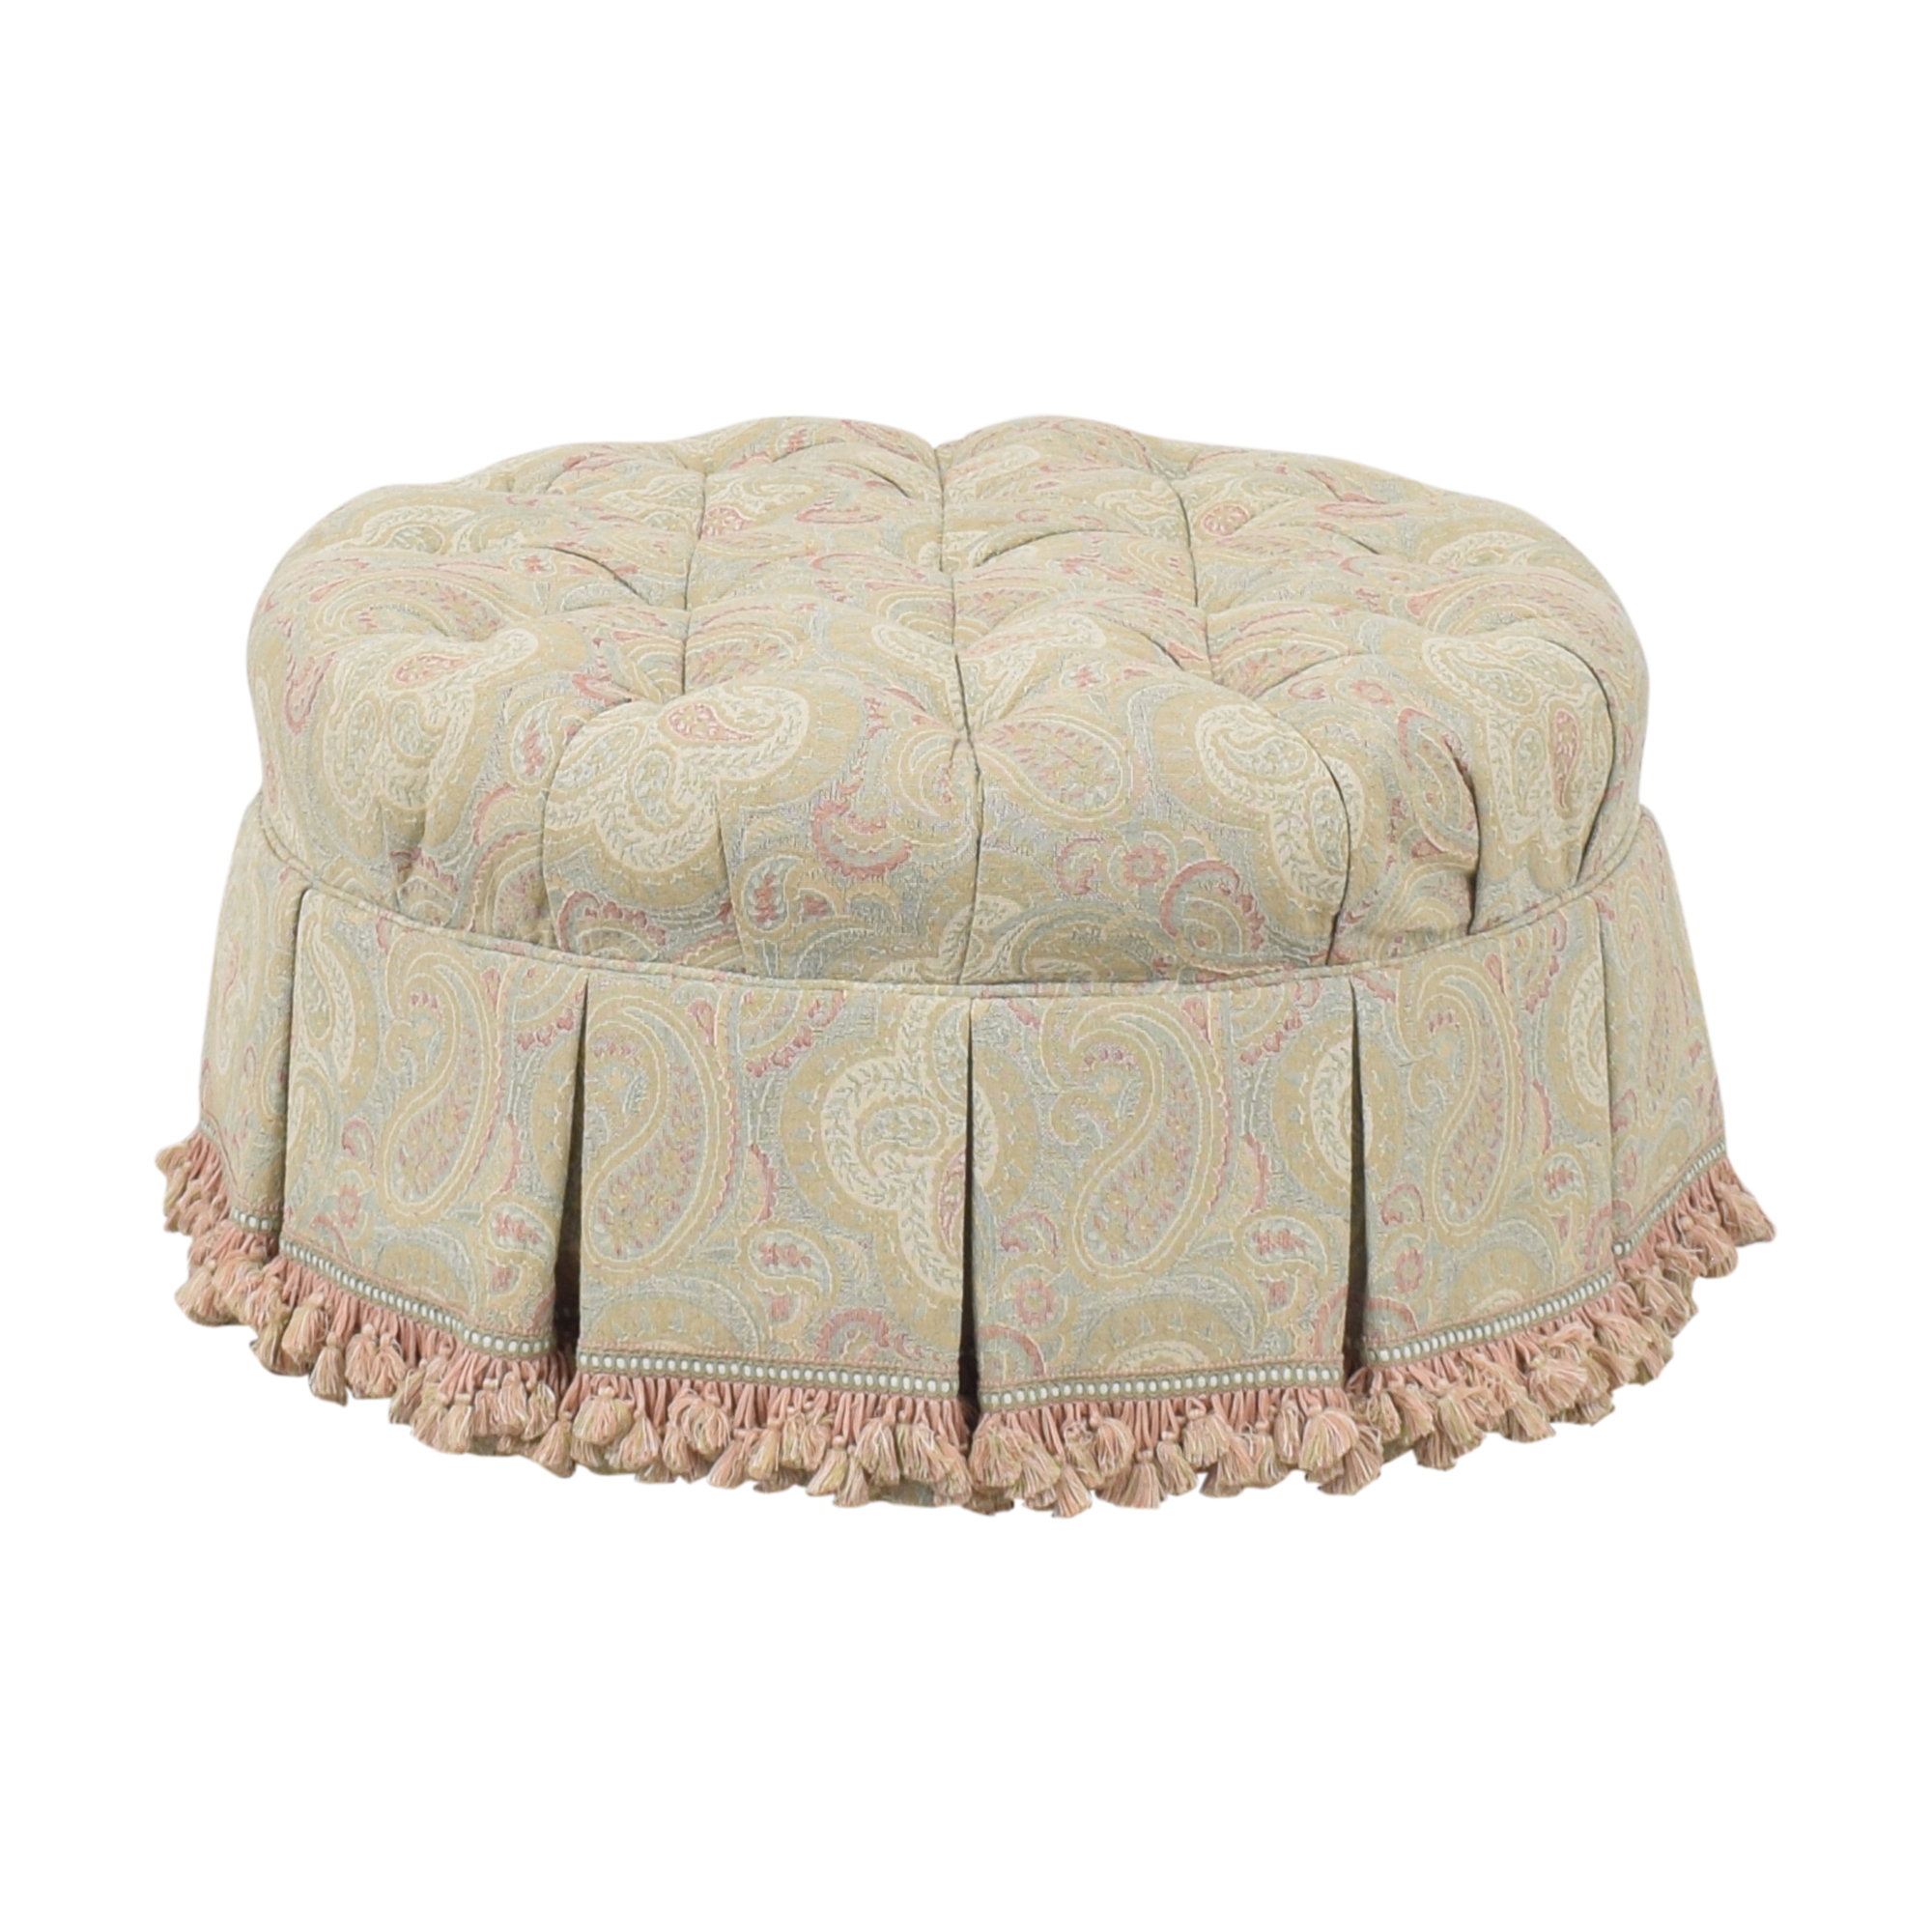 Century Tufted Round Ottoman / Chairs